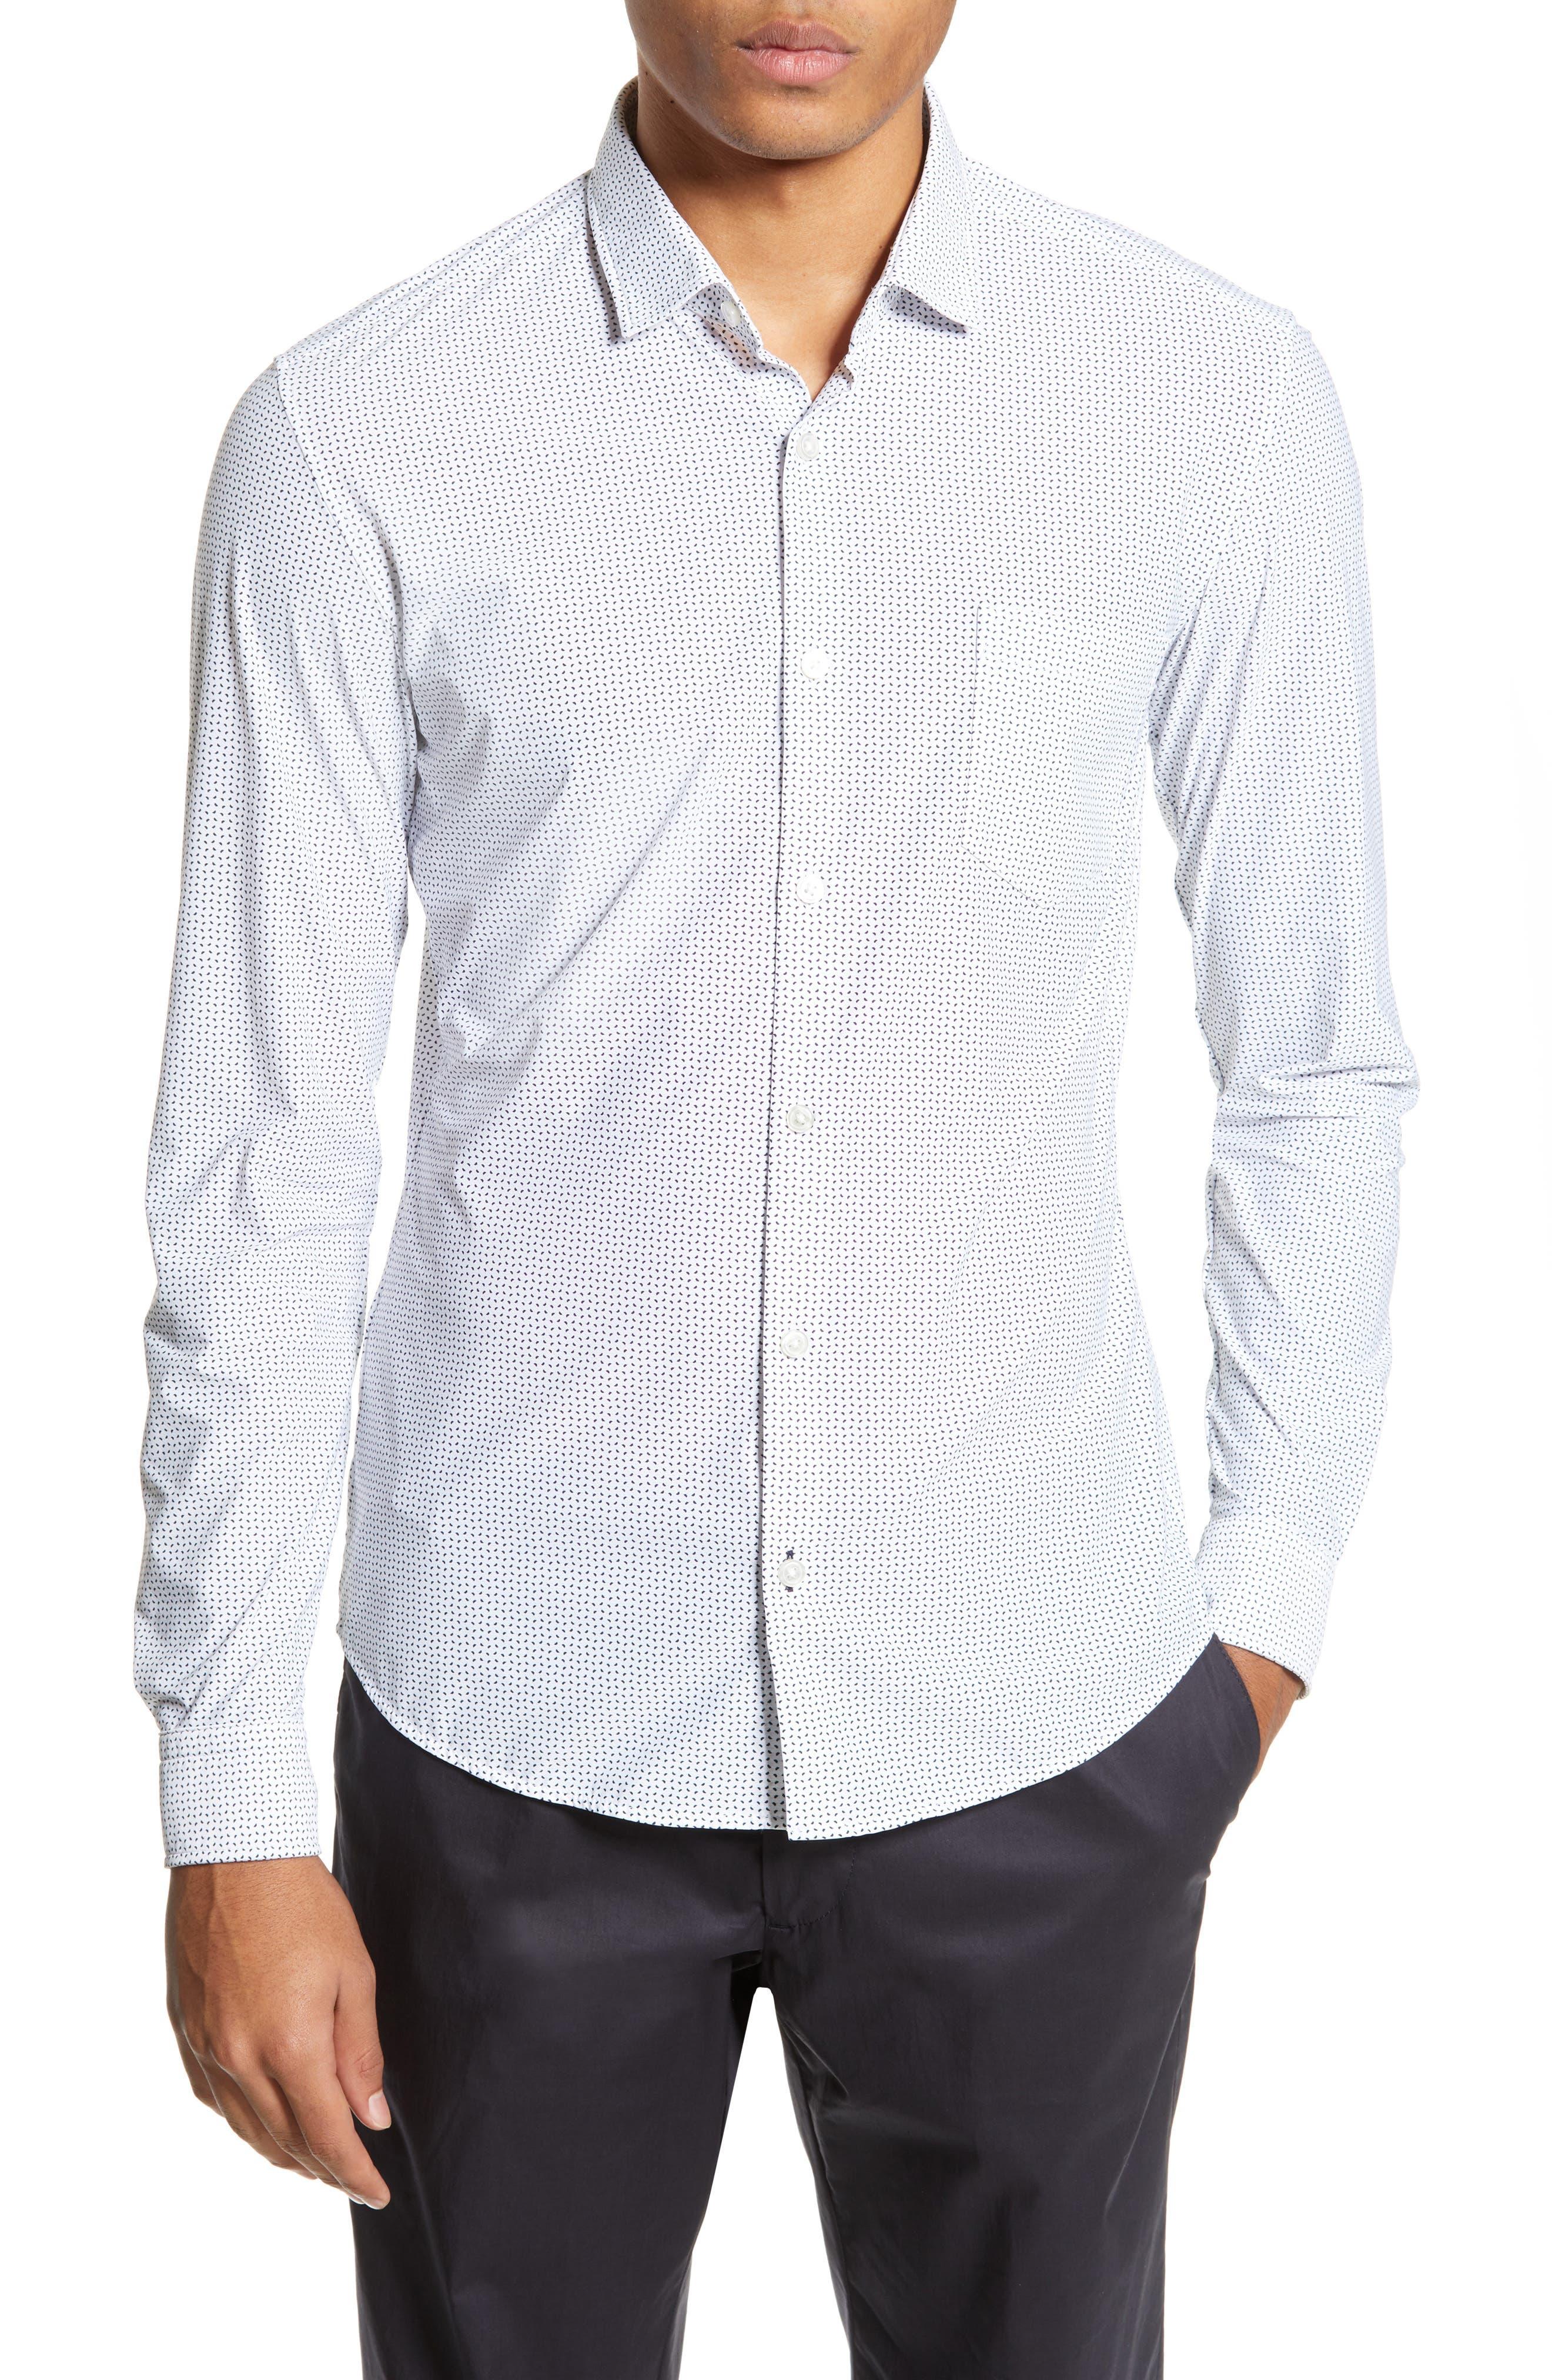 Rikki Slim Fit Microprint Sport Shirt,                             Main thumbnail 1, color,                             WHITE MICRO